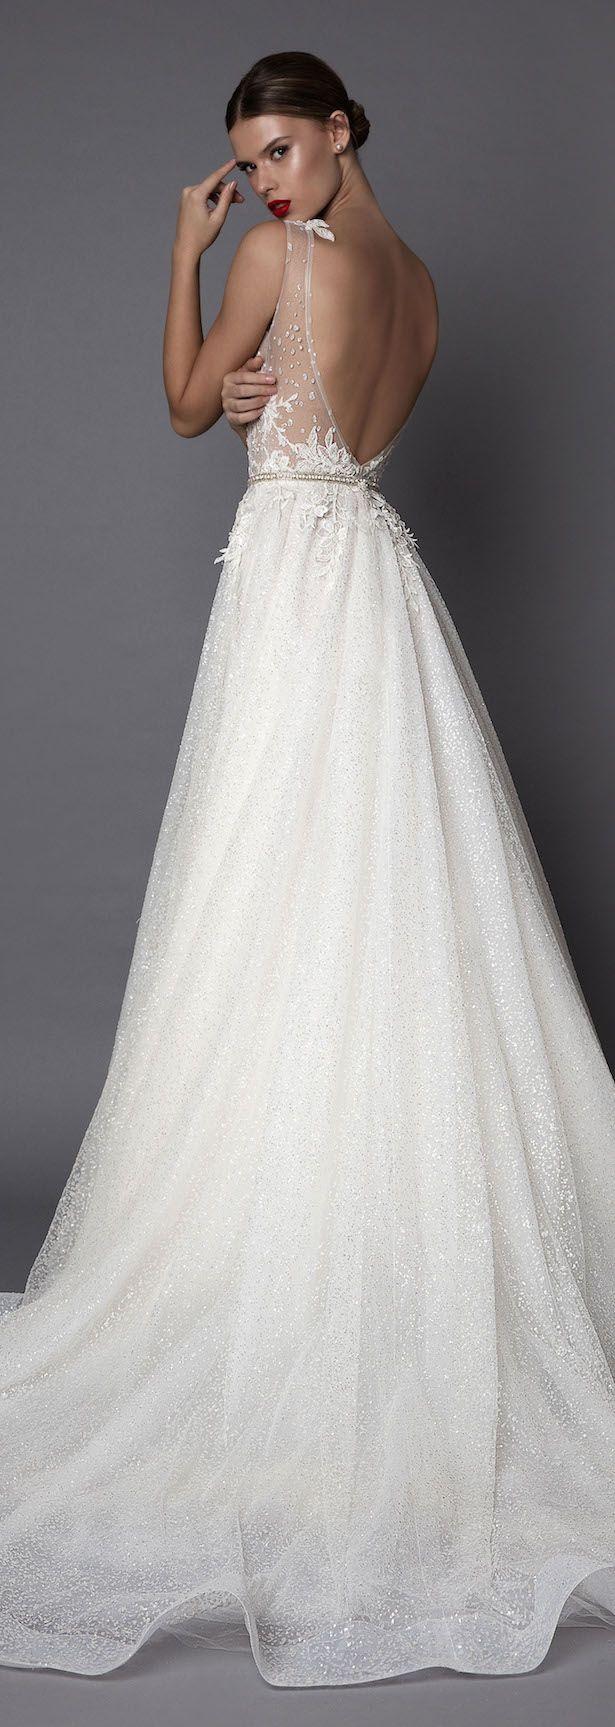 best bryllupper images on pinterest wedding bridesmaid dresses